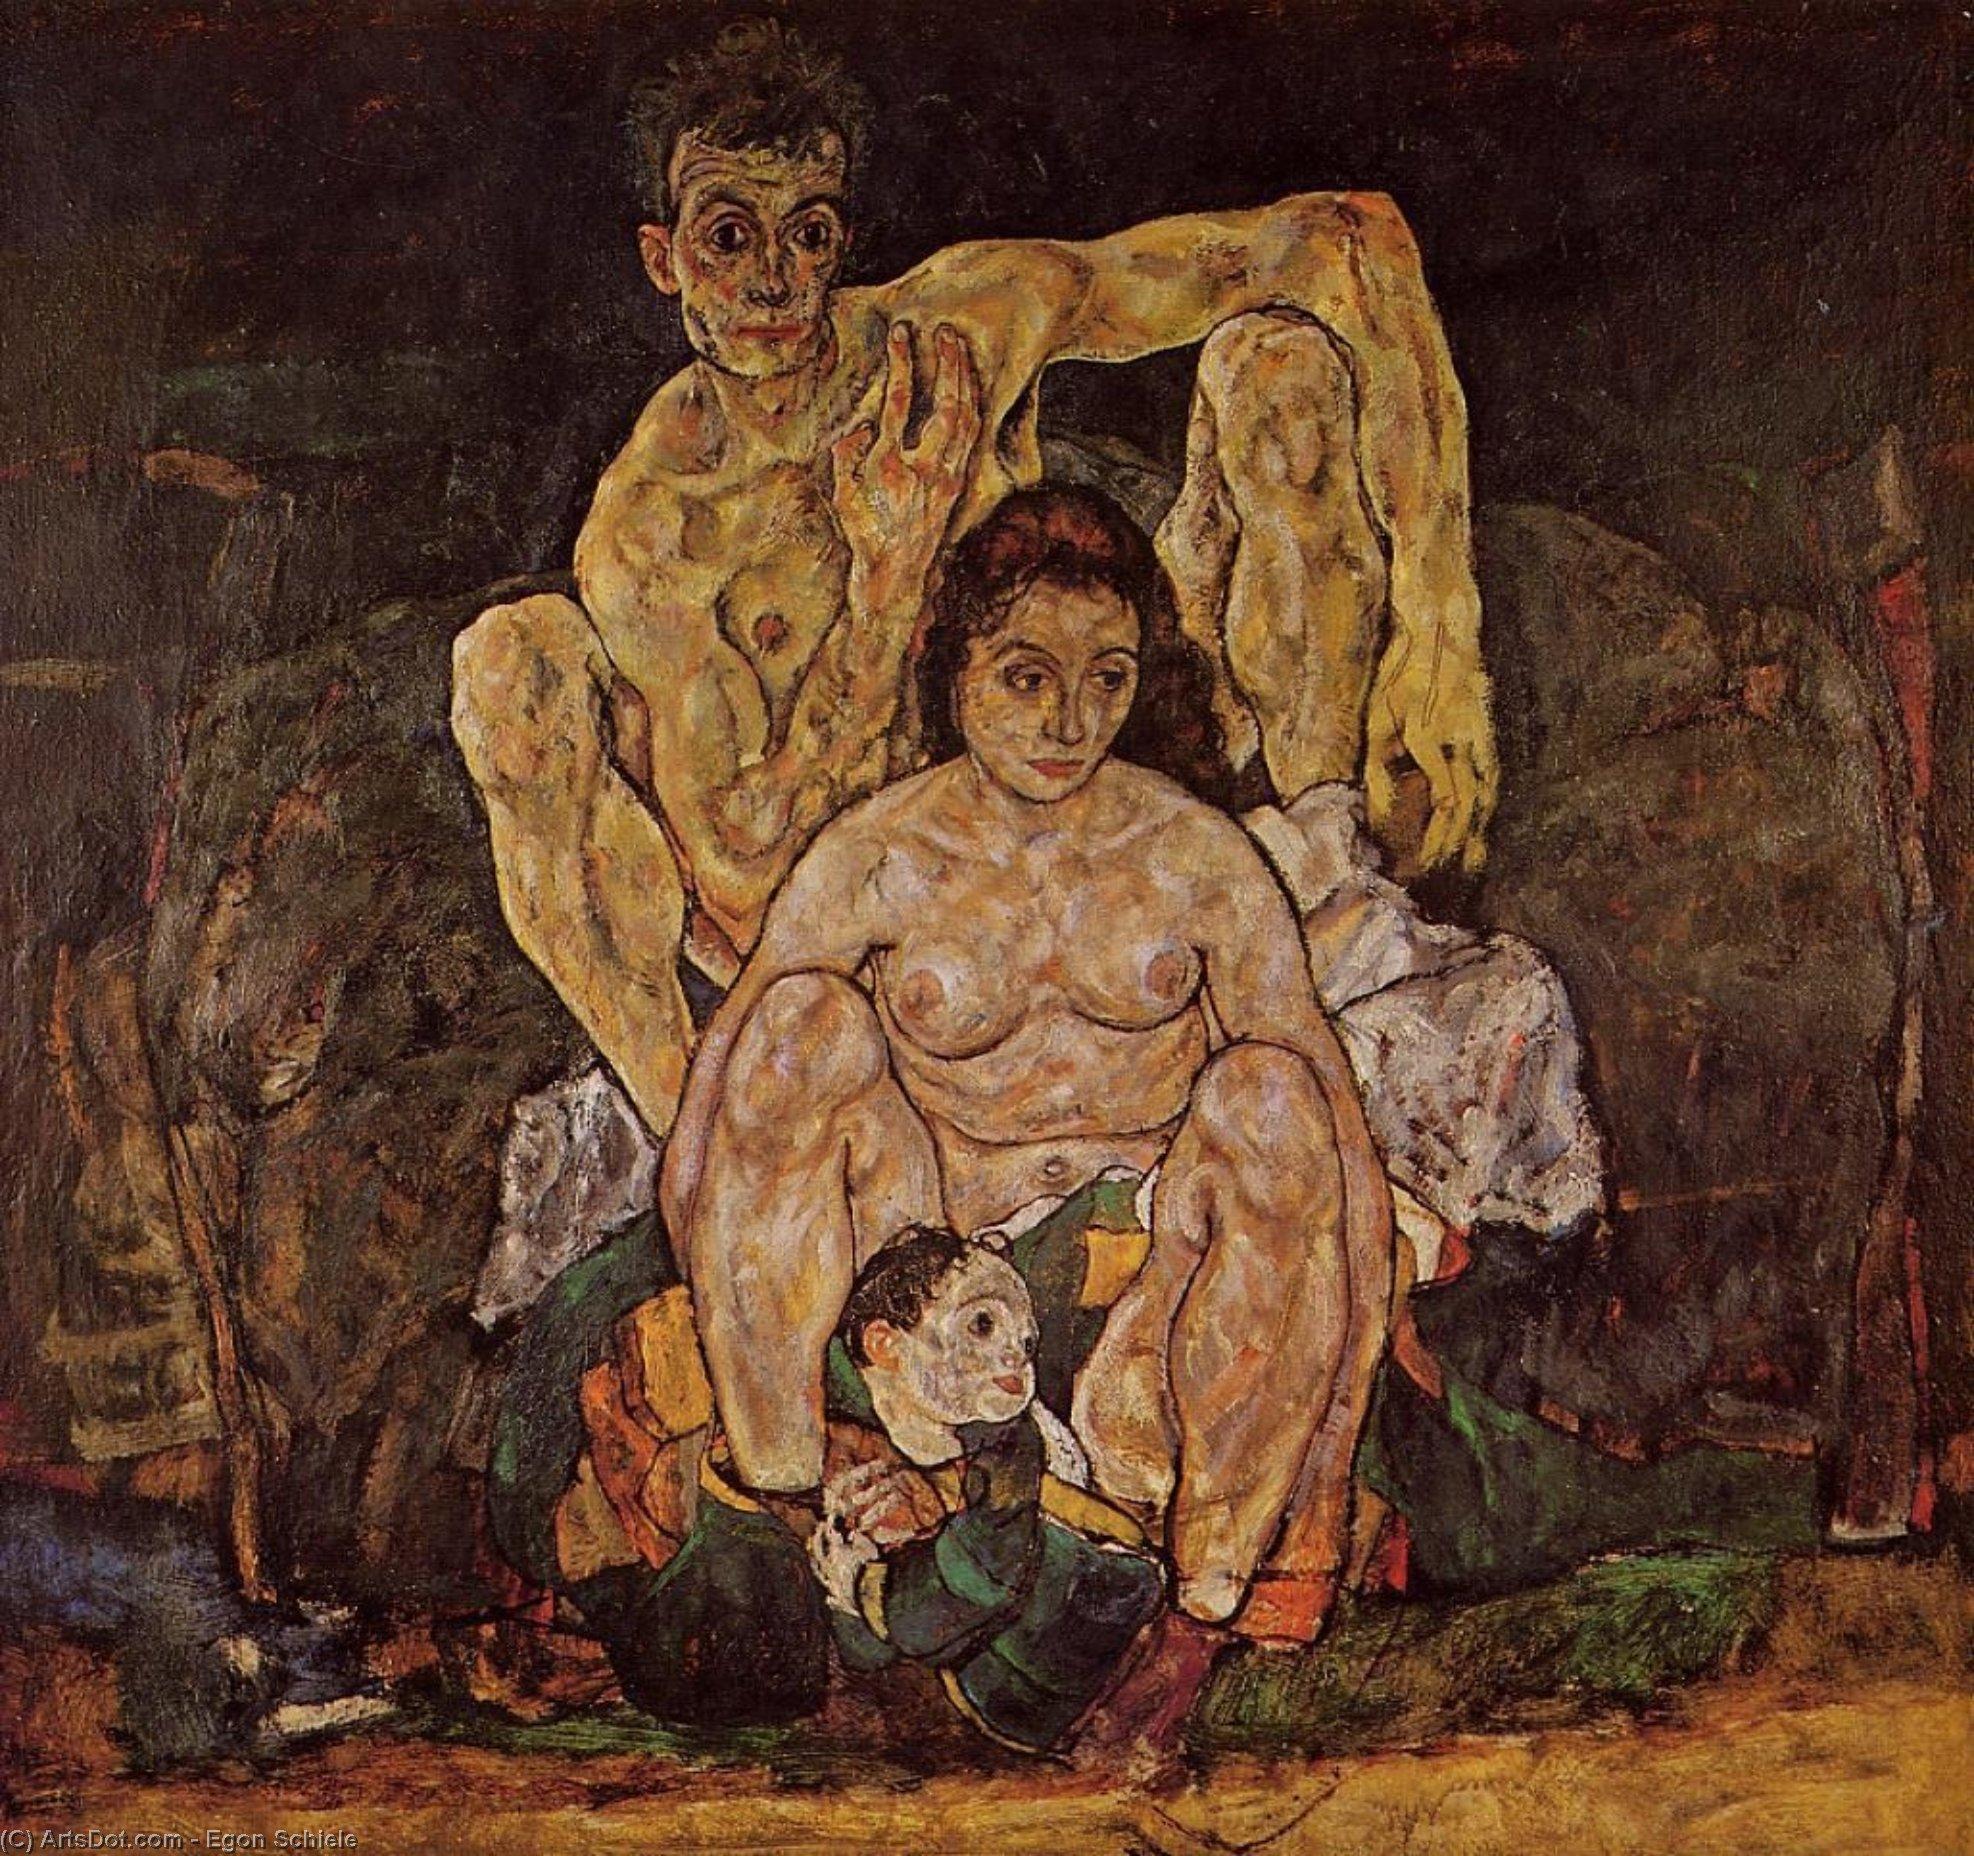 Wikoo.org - موسوعة الفنون الجميلة - اللوحة، العمل الفني Egon Schiele - The Family